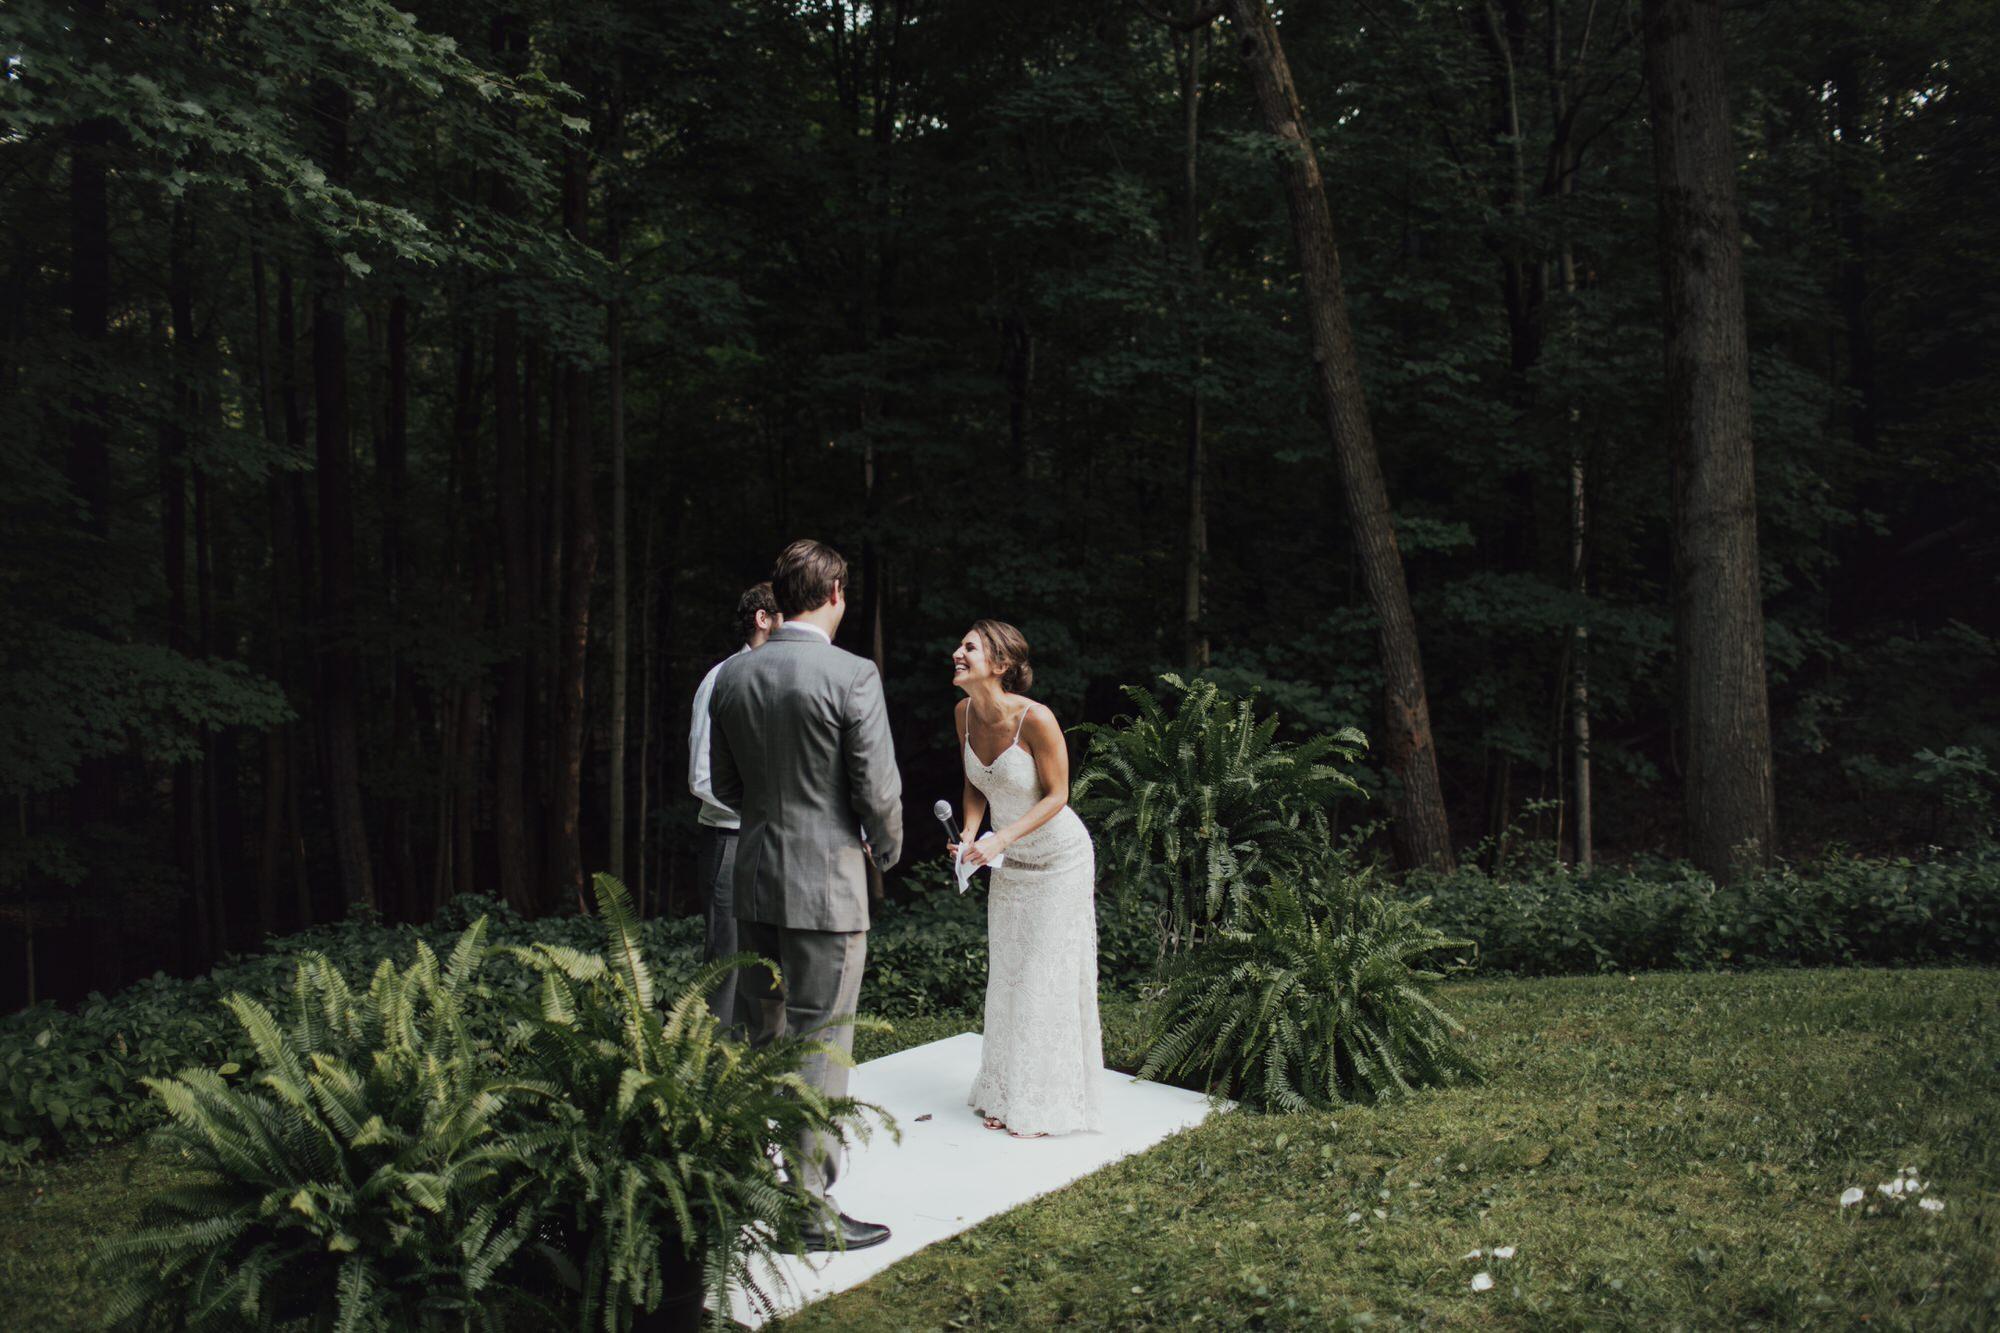 emily-aaron-rochester-new-york-wedding-photographer-74.JPG